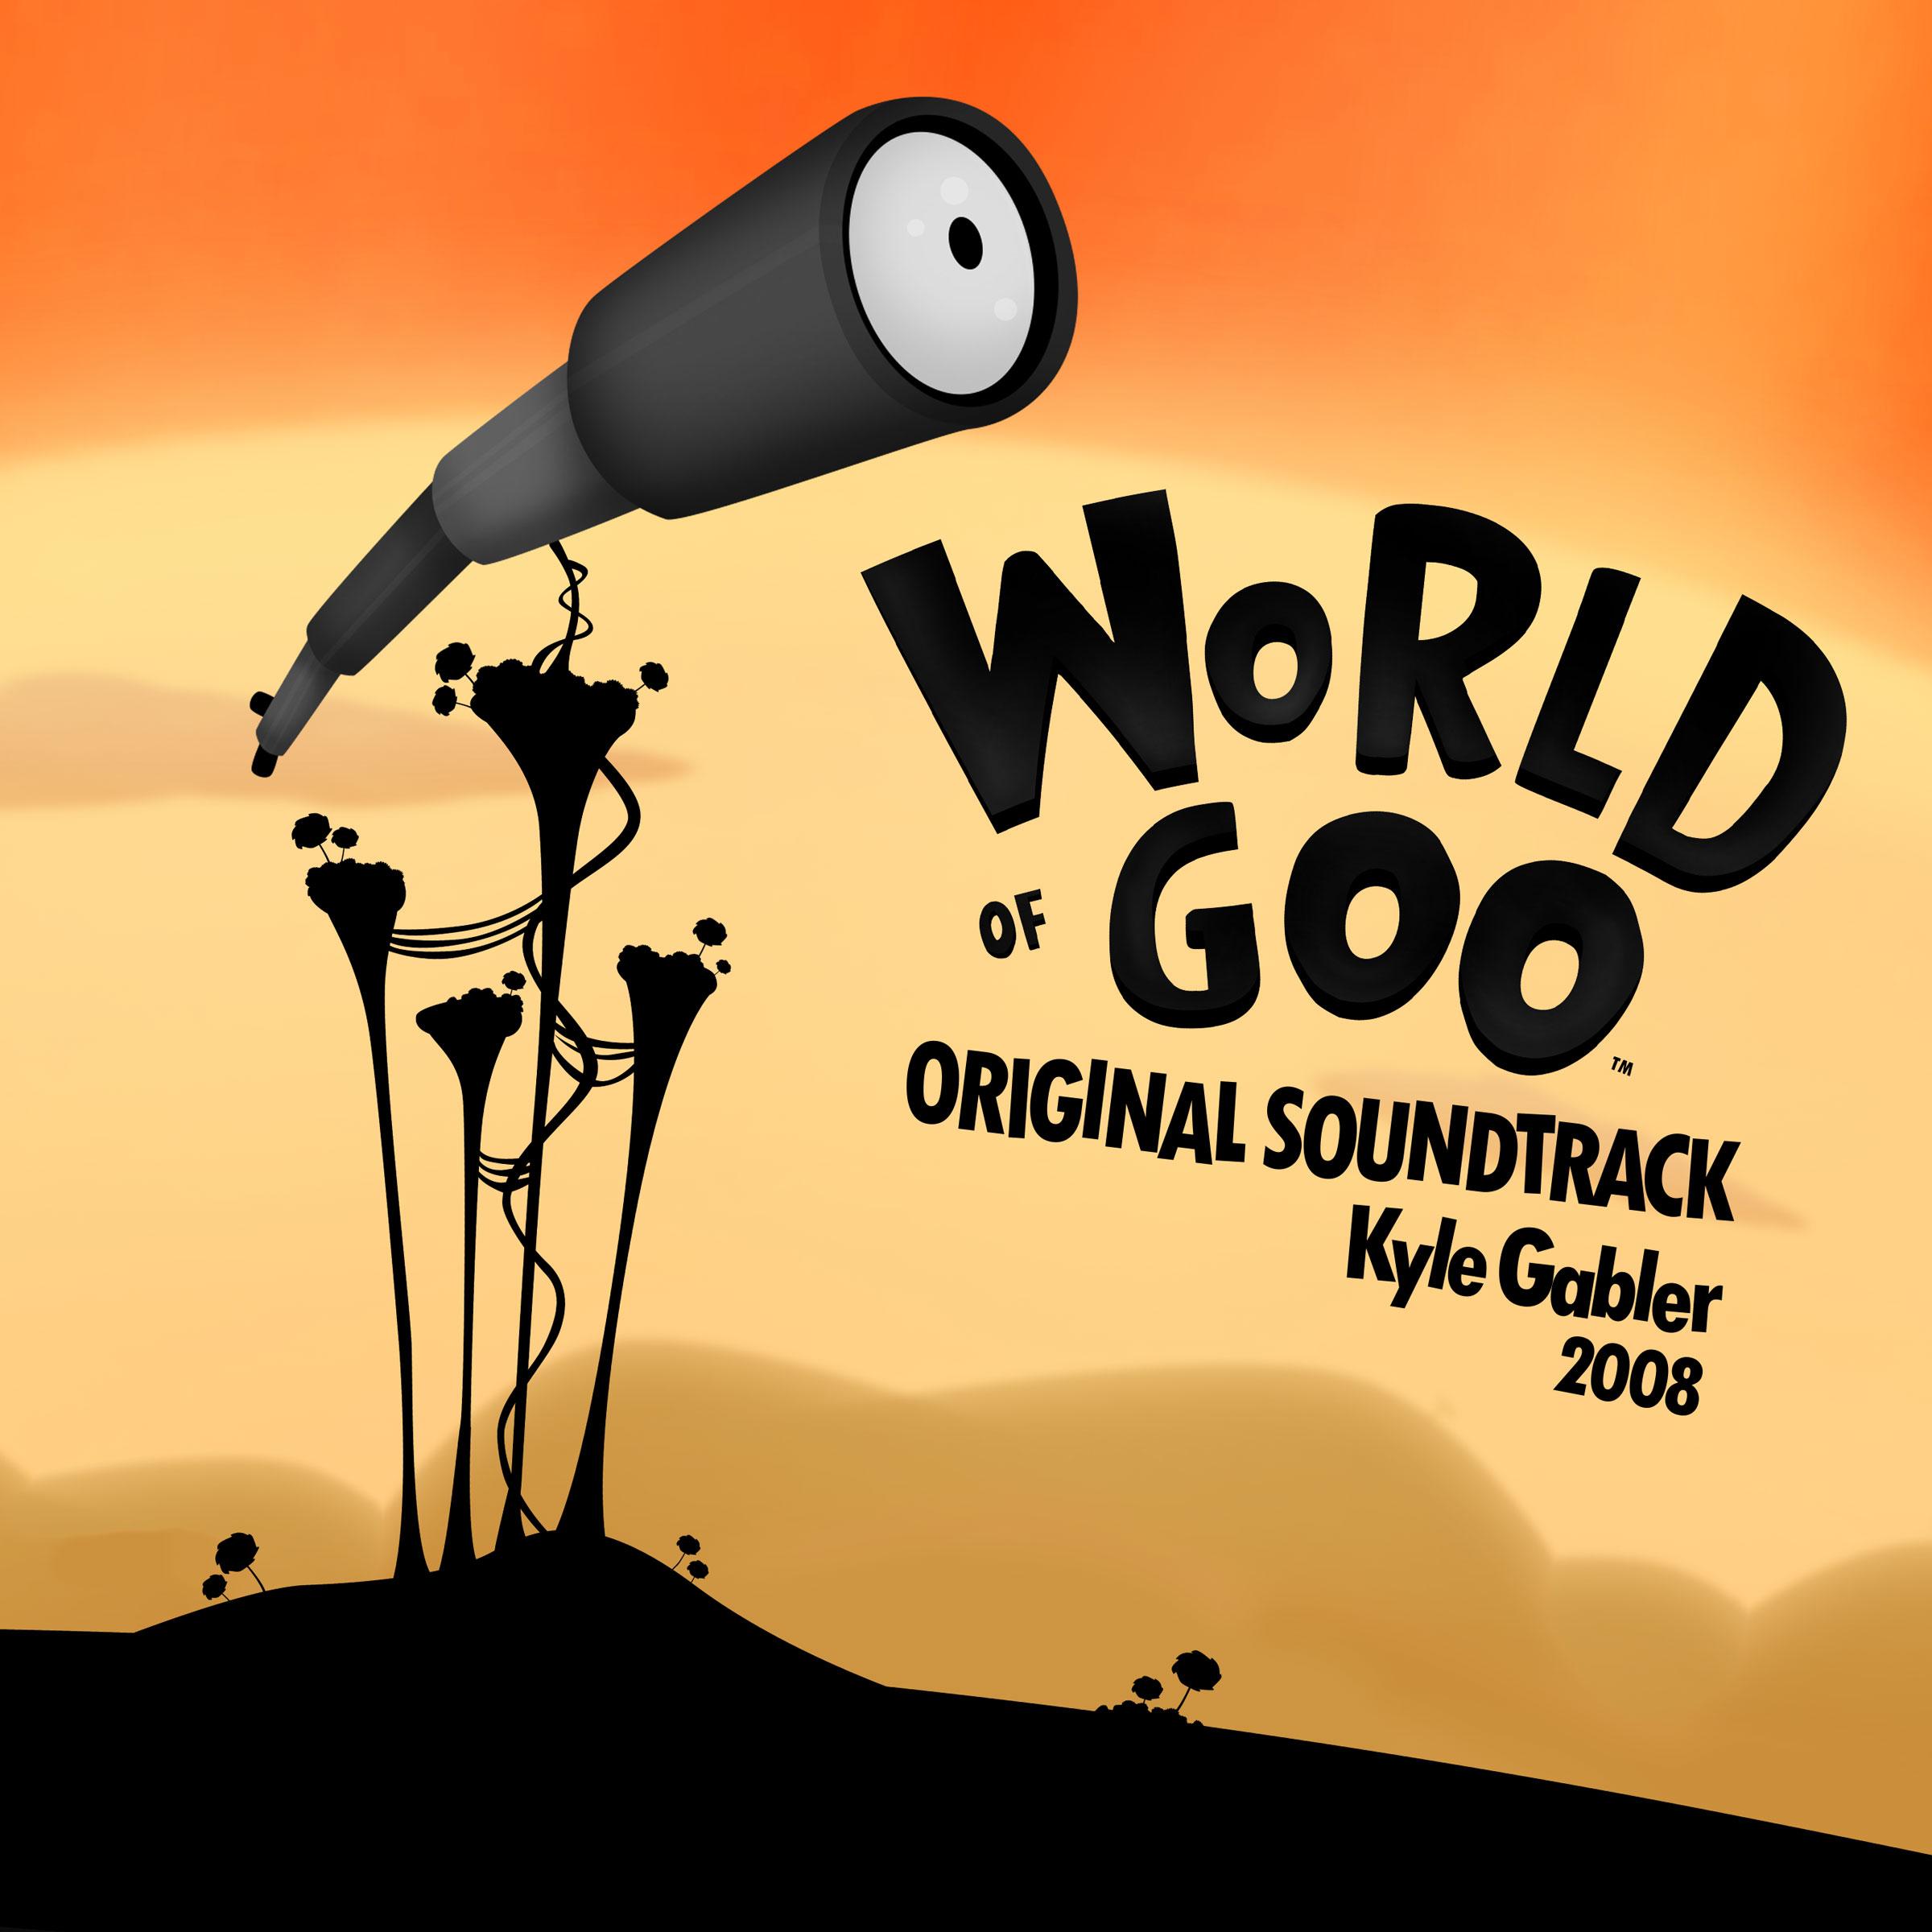 World Of Goo Original Soundtrack Mp3 Download World Of Goo Original Soundtrack Soundtracks For Free